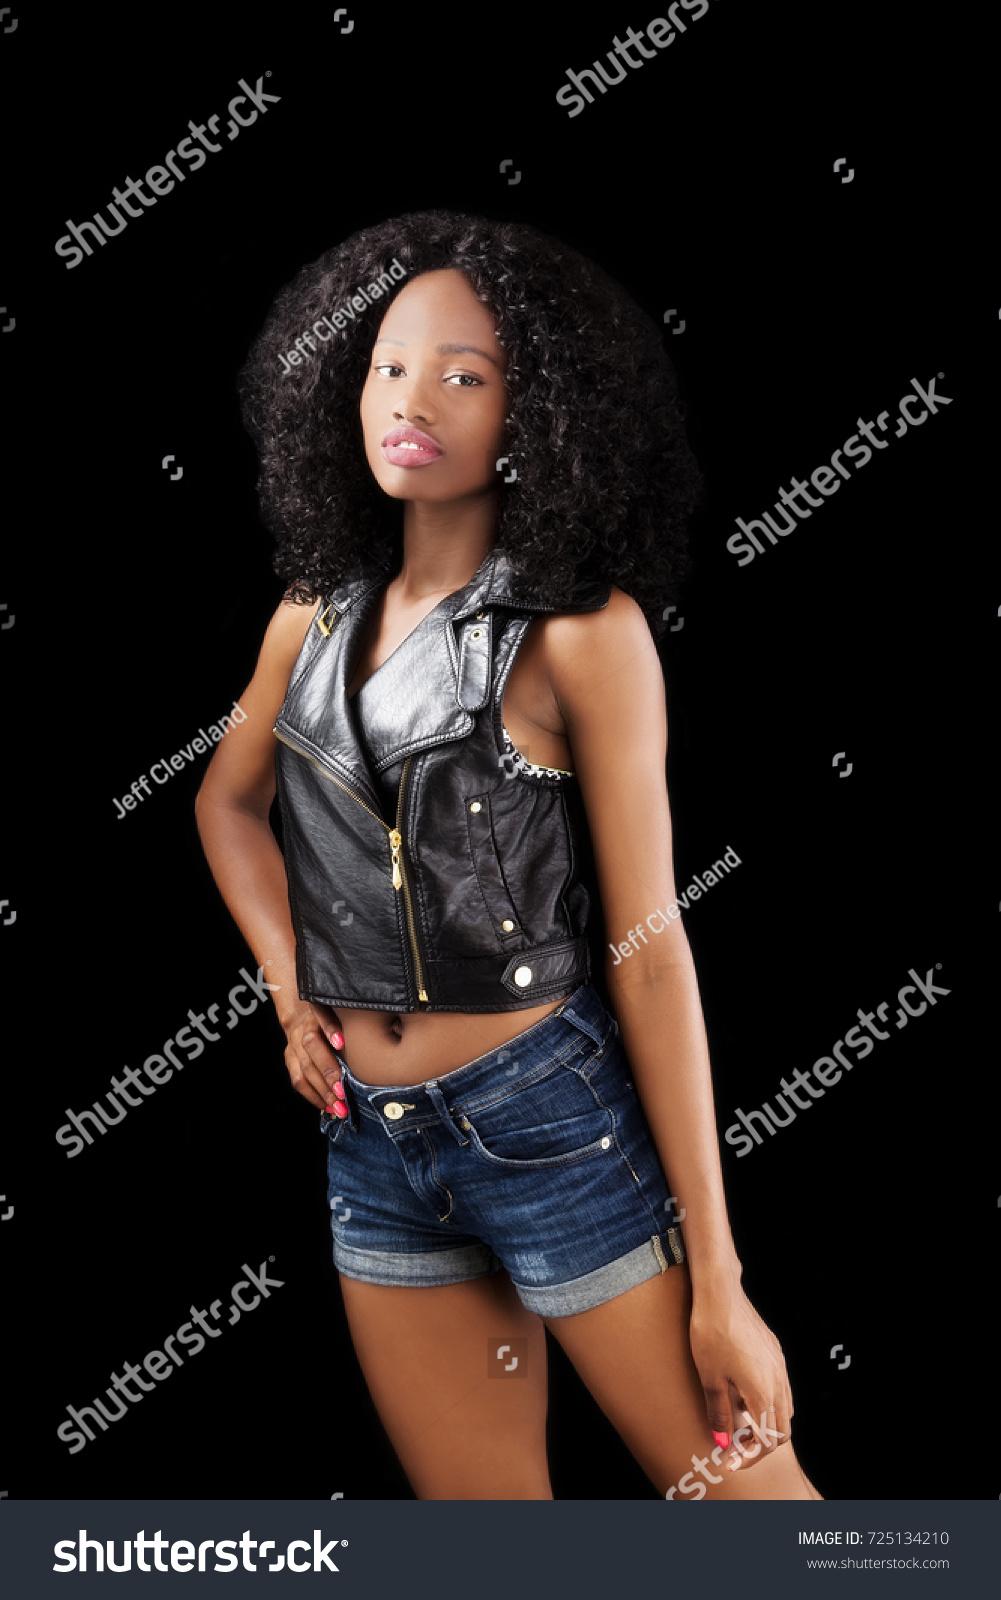 African american teen models interesting